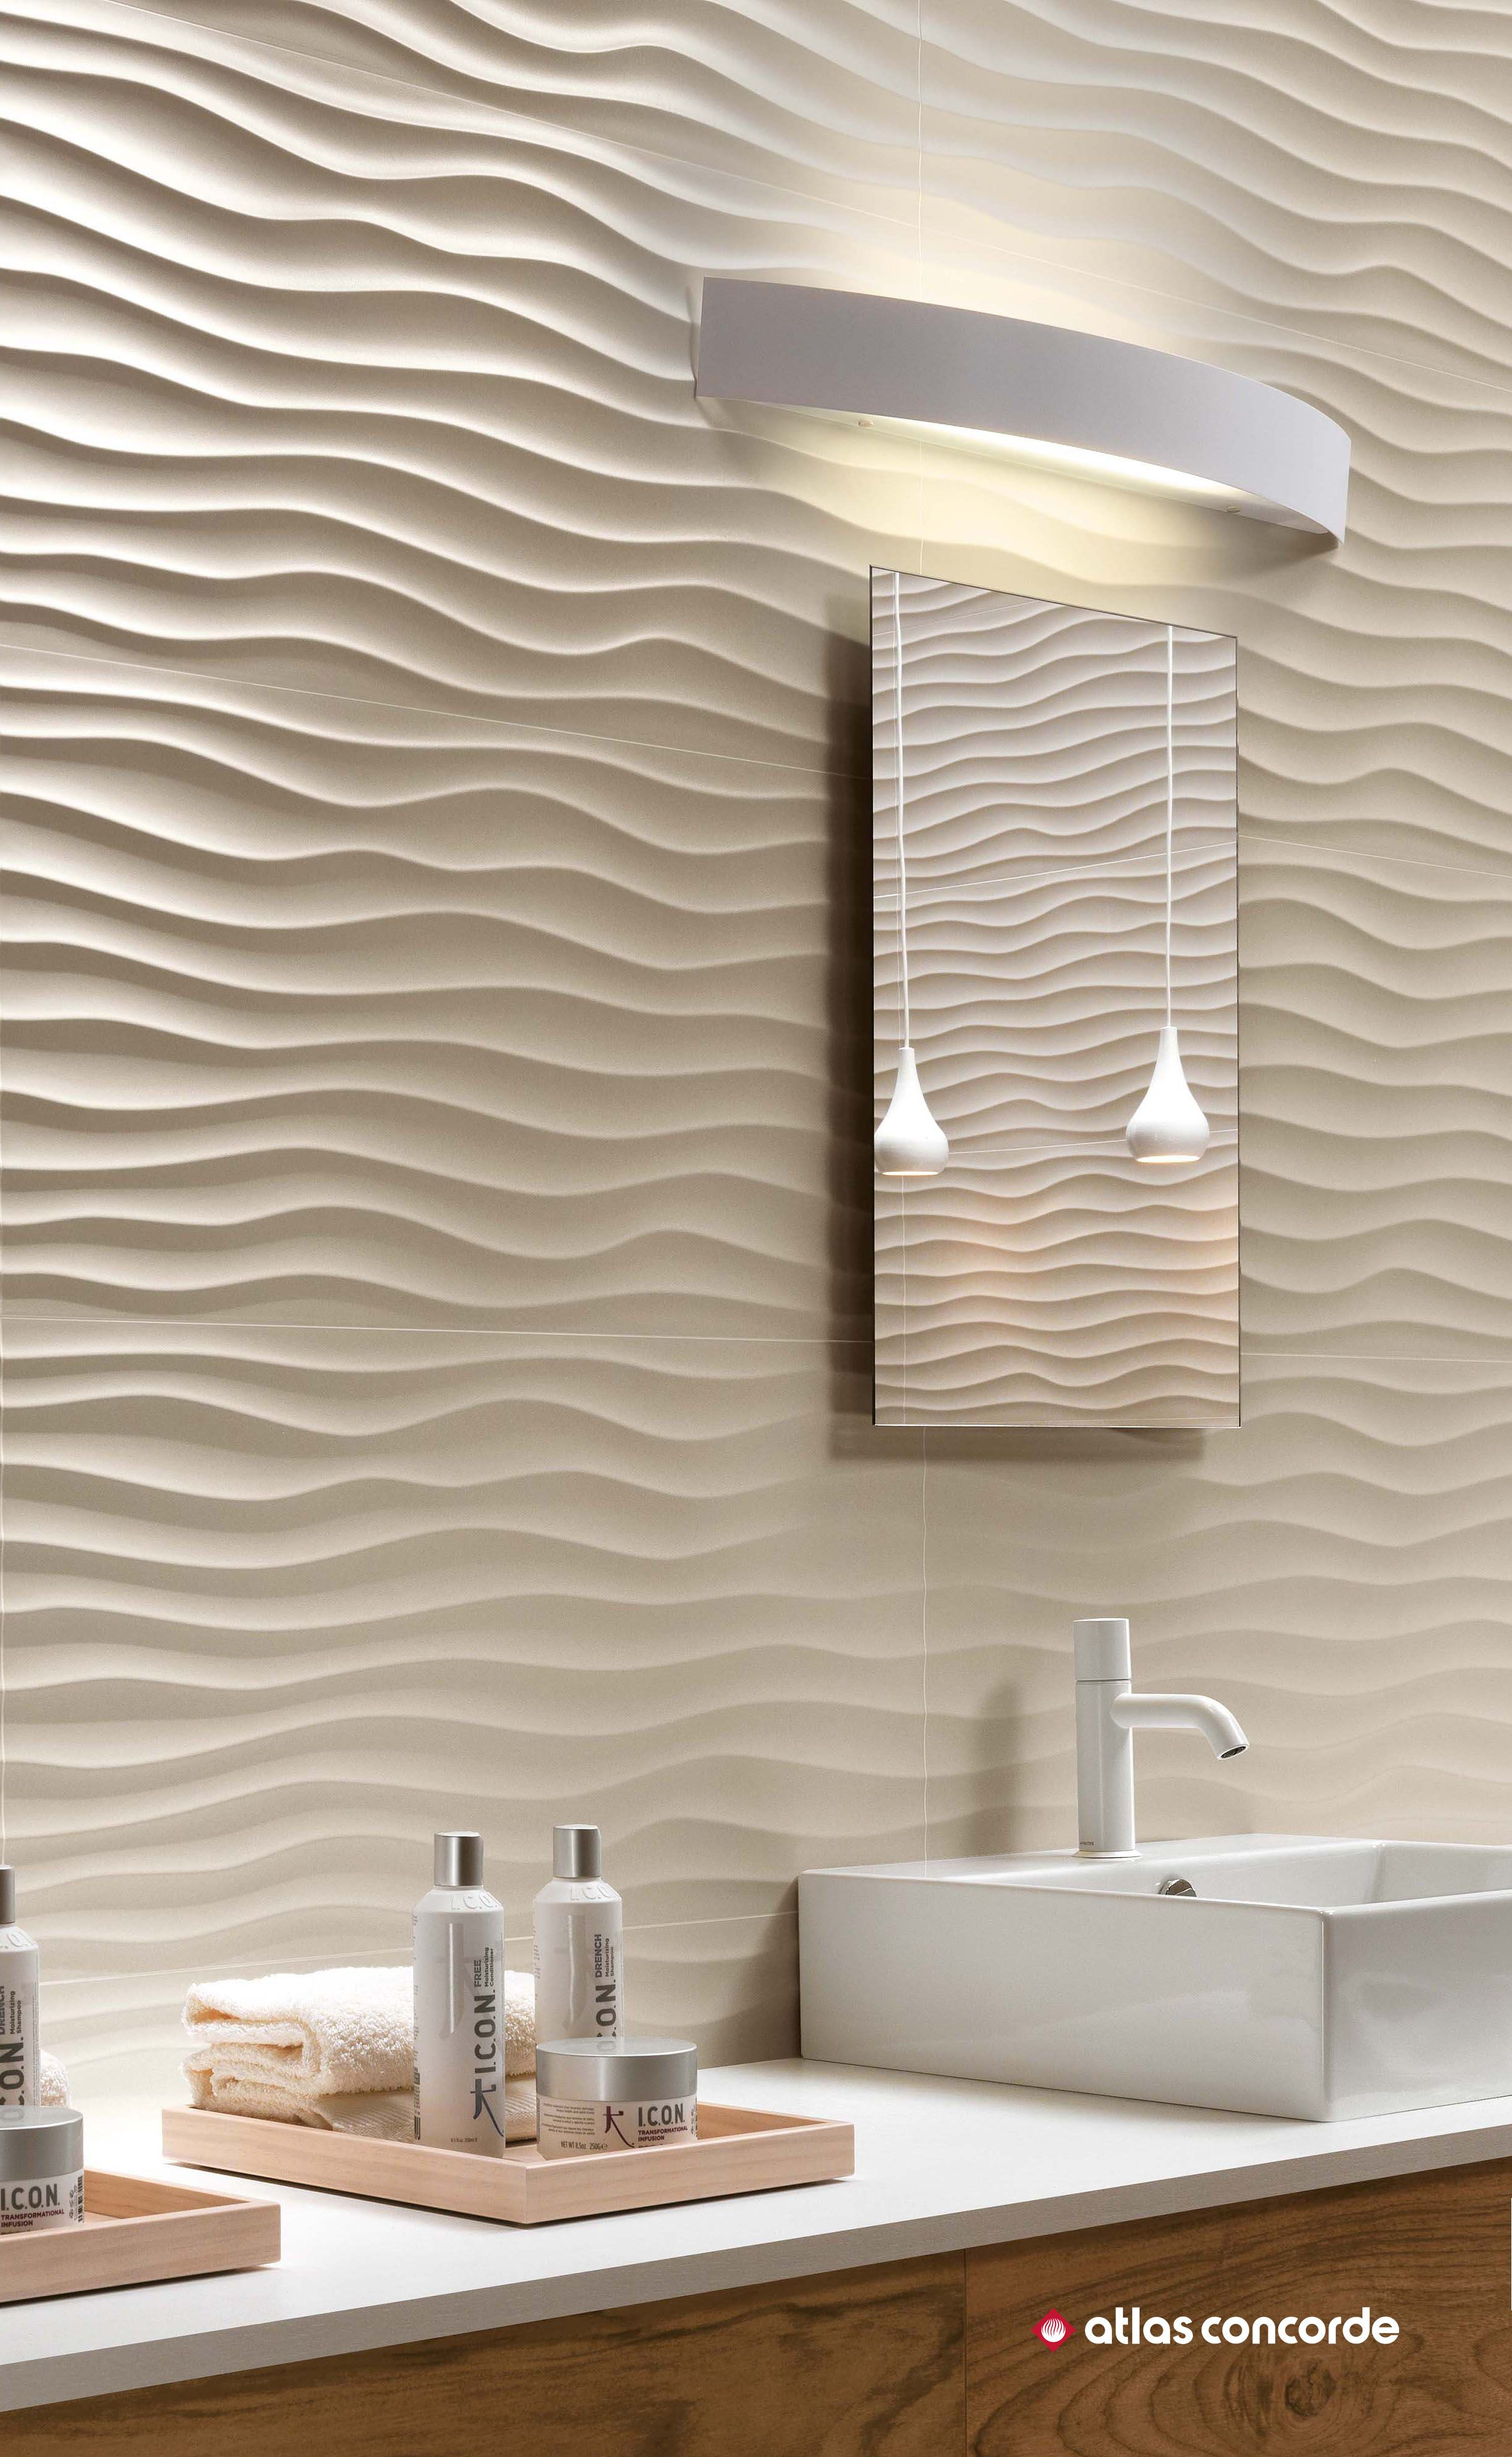 3d Wall Tiles For Bathrooms Kitchens Spas Bathroom Wall Tile